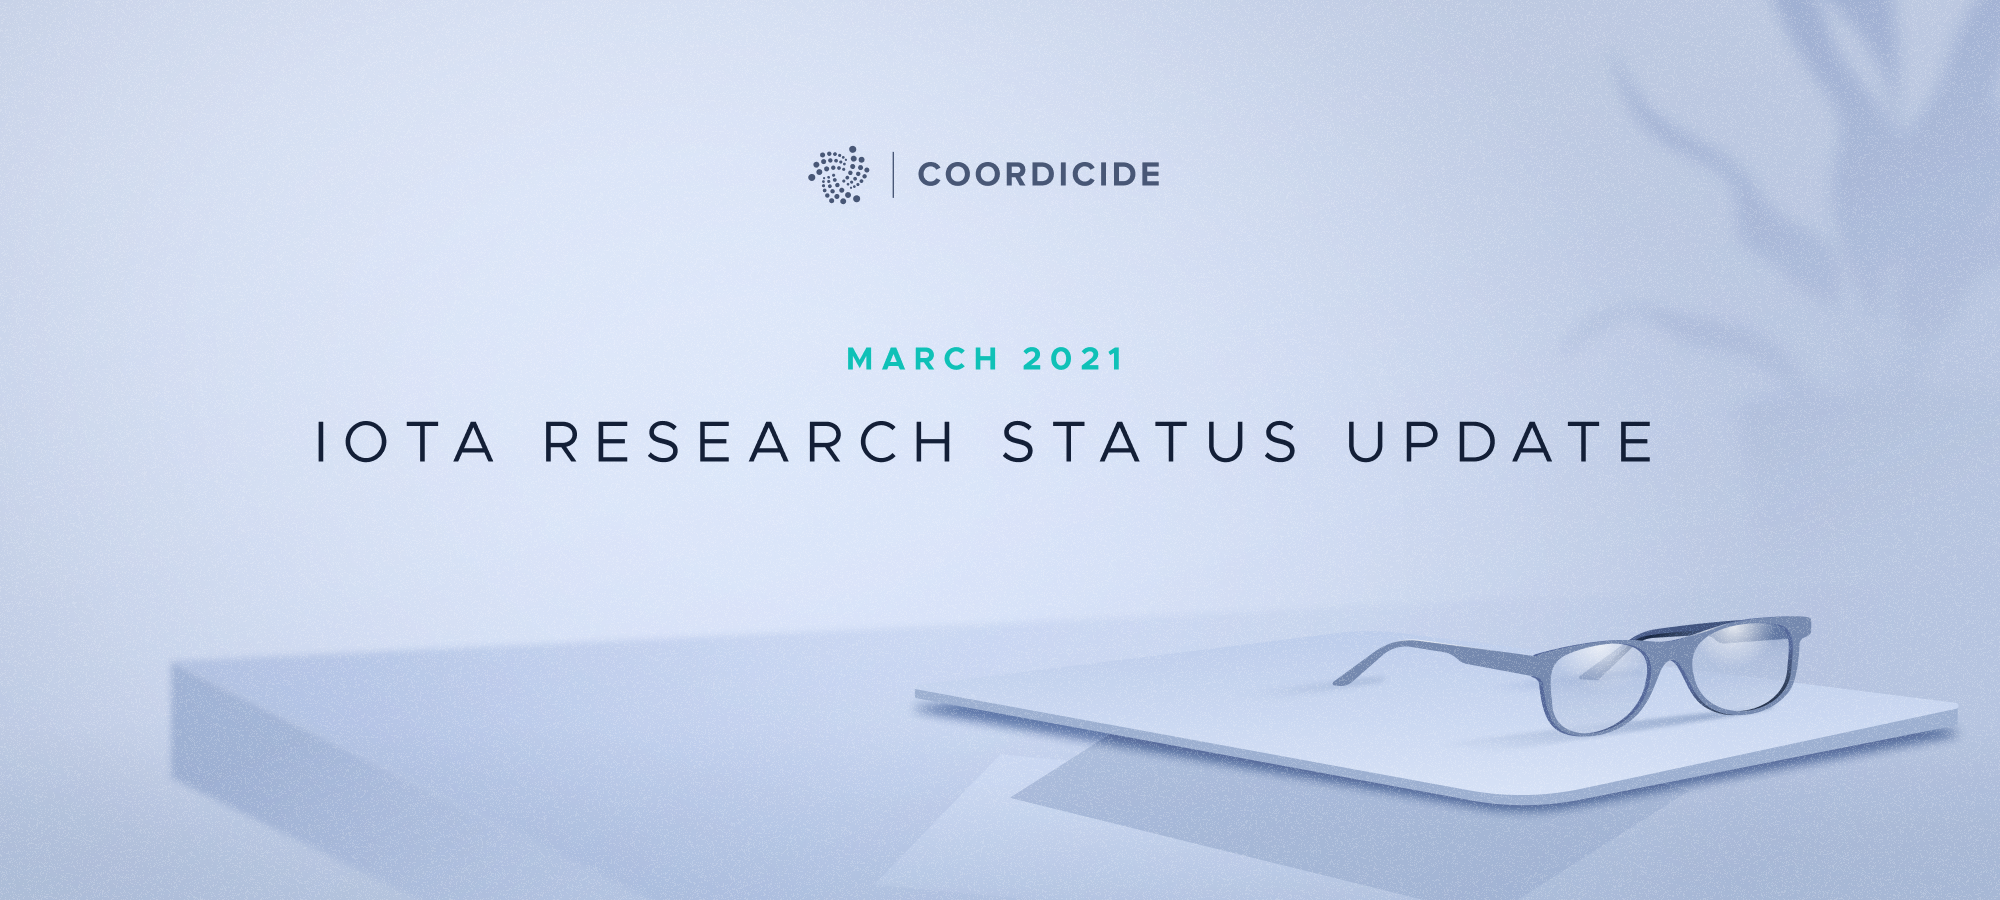 IOTA Research Status Update March 2021